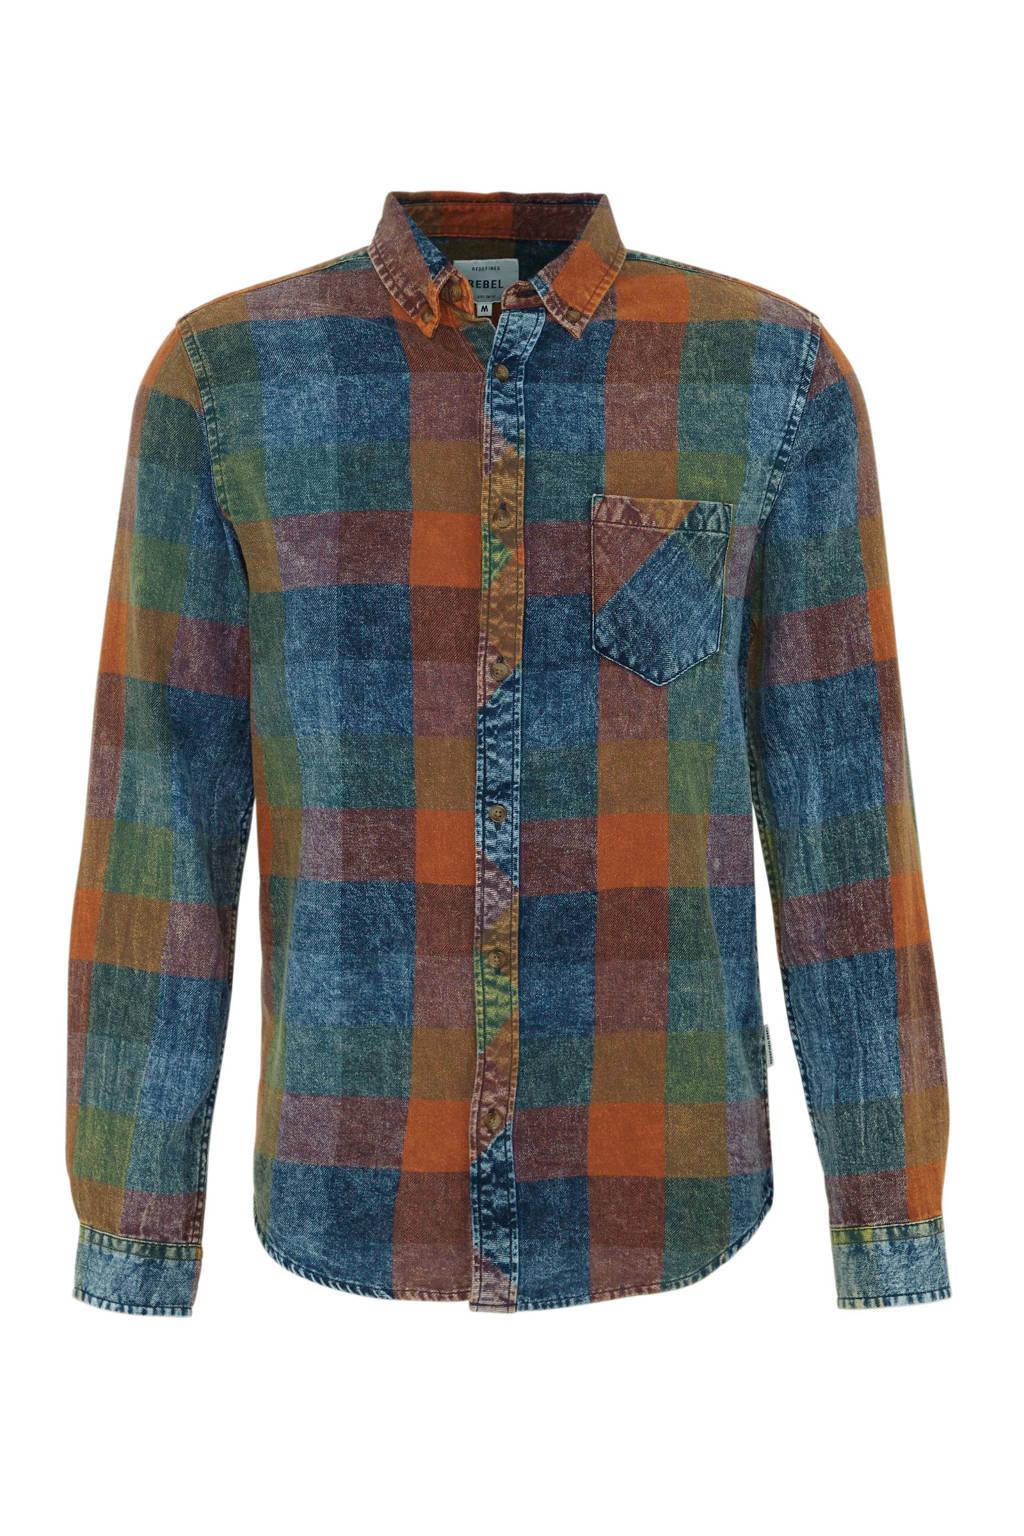 Redefined Rebel regular fit overhemd blauw/multi-kleuren, Blauw/multi-kleuren